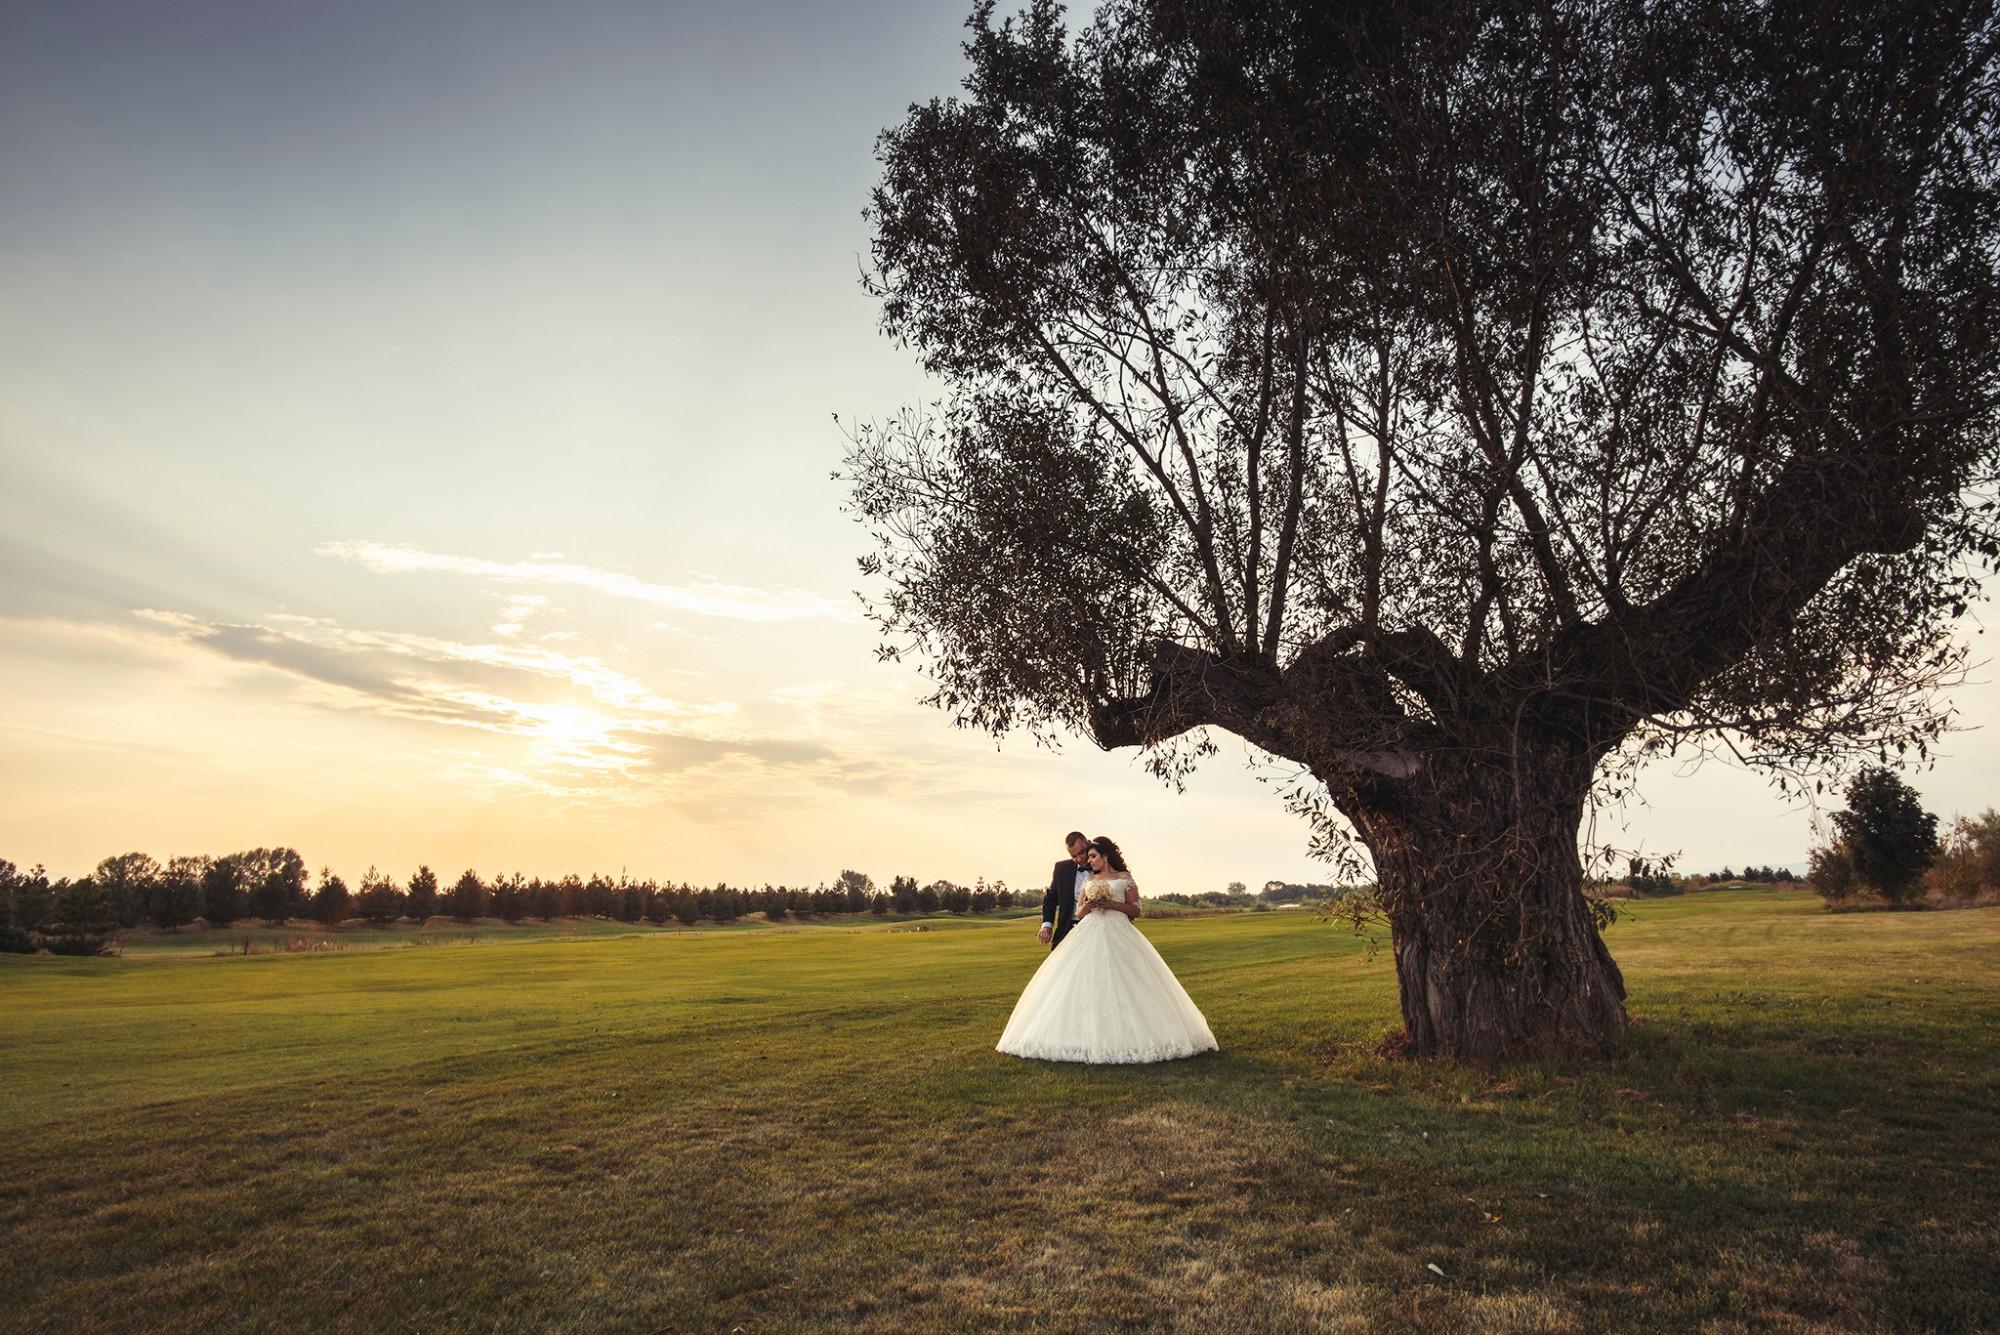 Сватбен фотограф, сватбена фотография